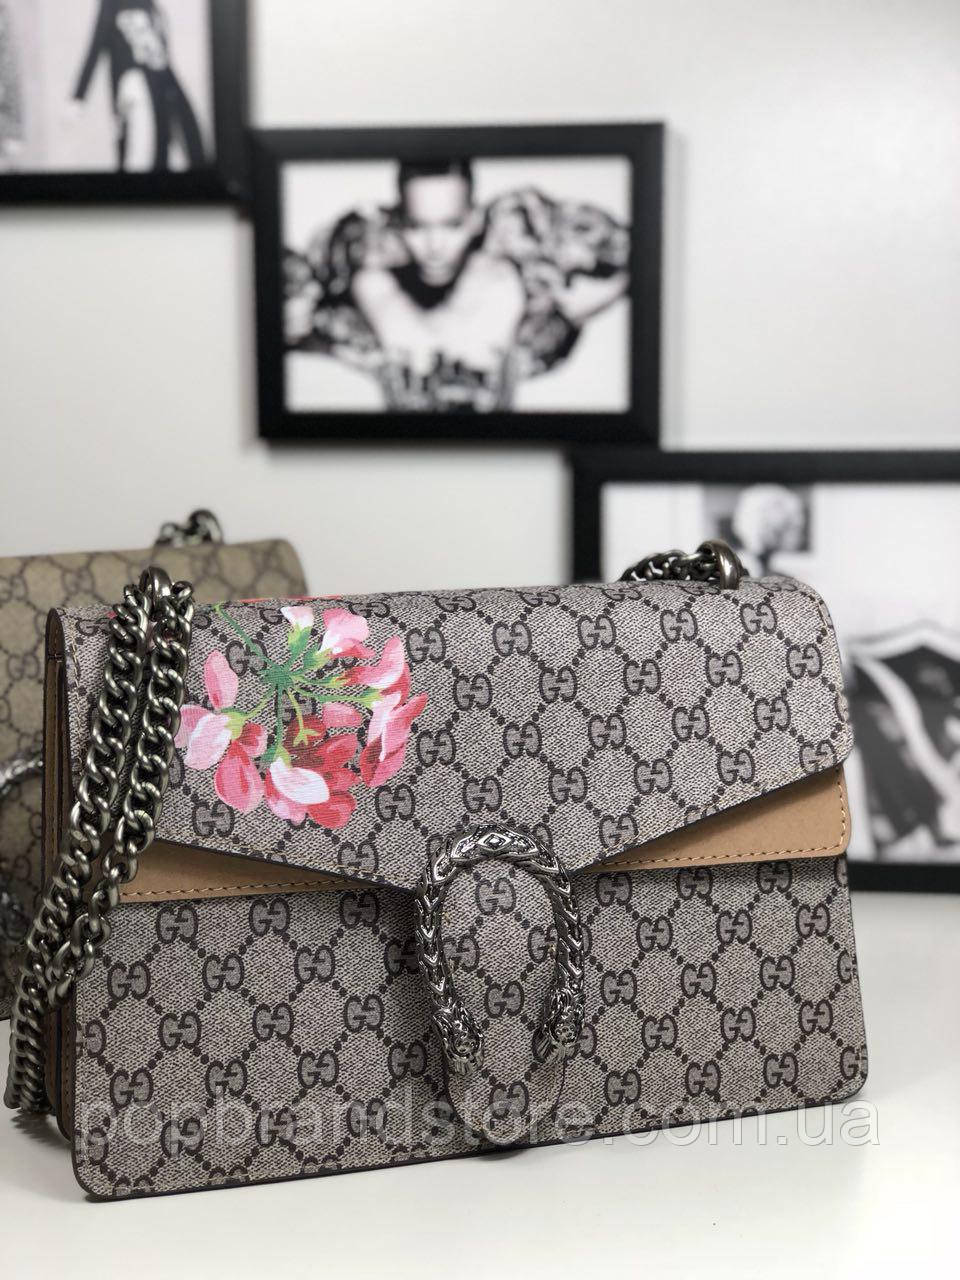 4681886a8a14 Женская сумочка Gucci DIONYSUS BAG LUX цветы (реплика) - Pop Brand Store |  брендовые